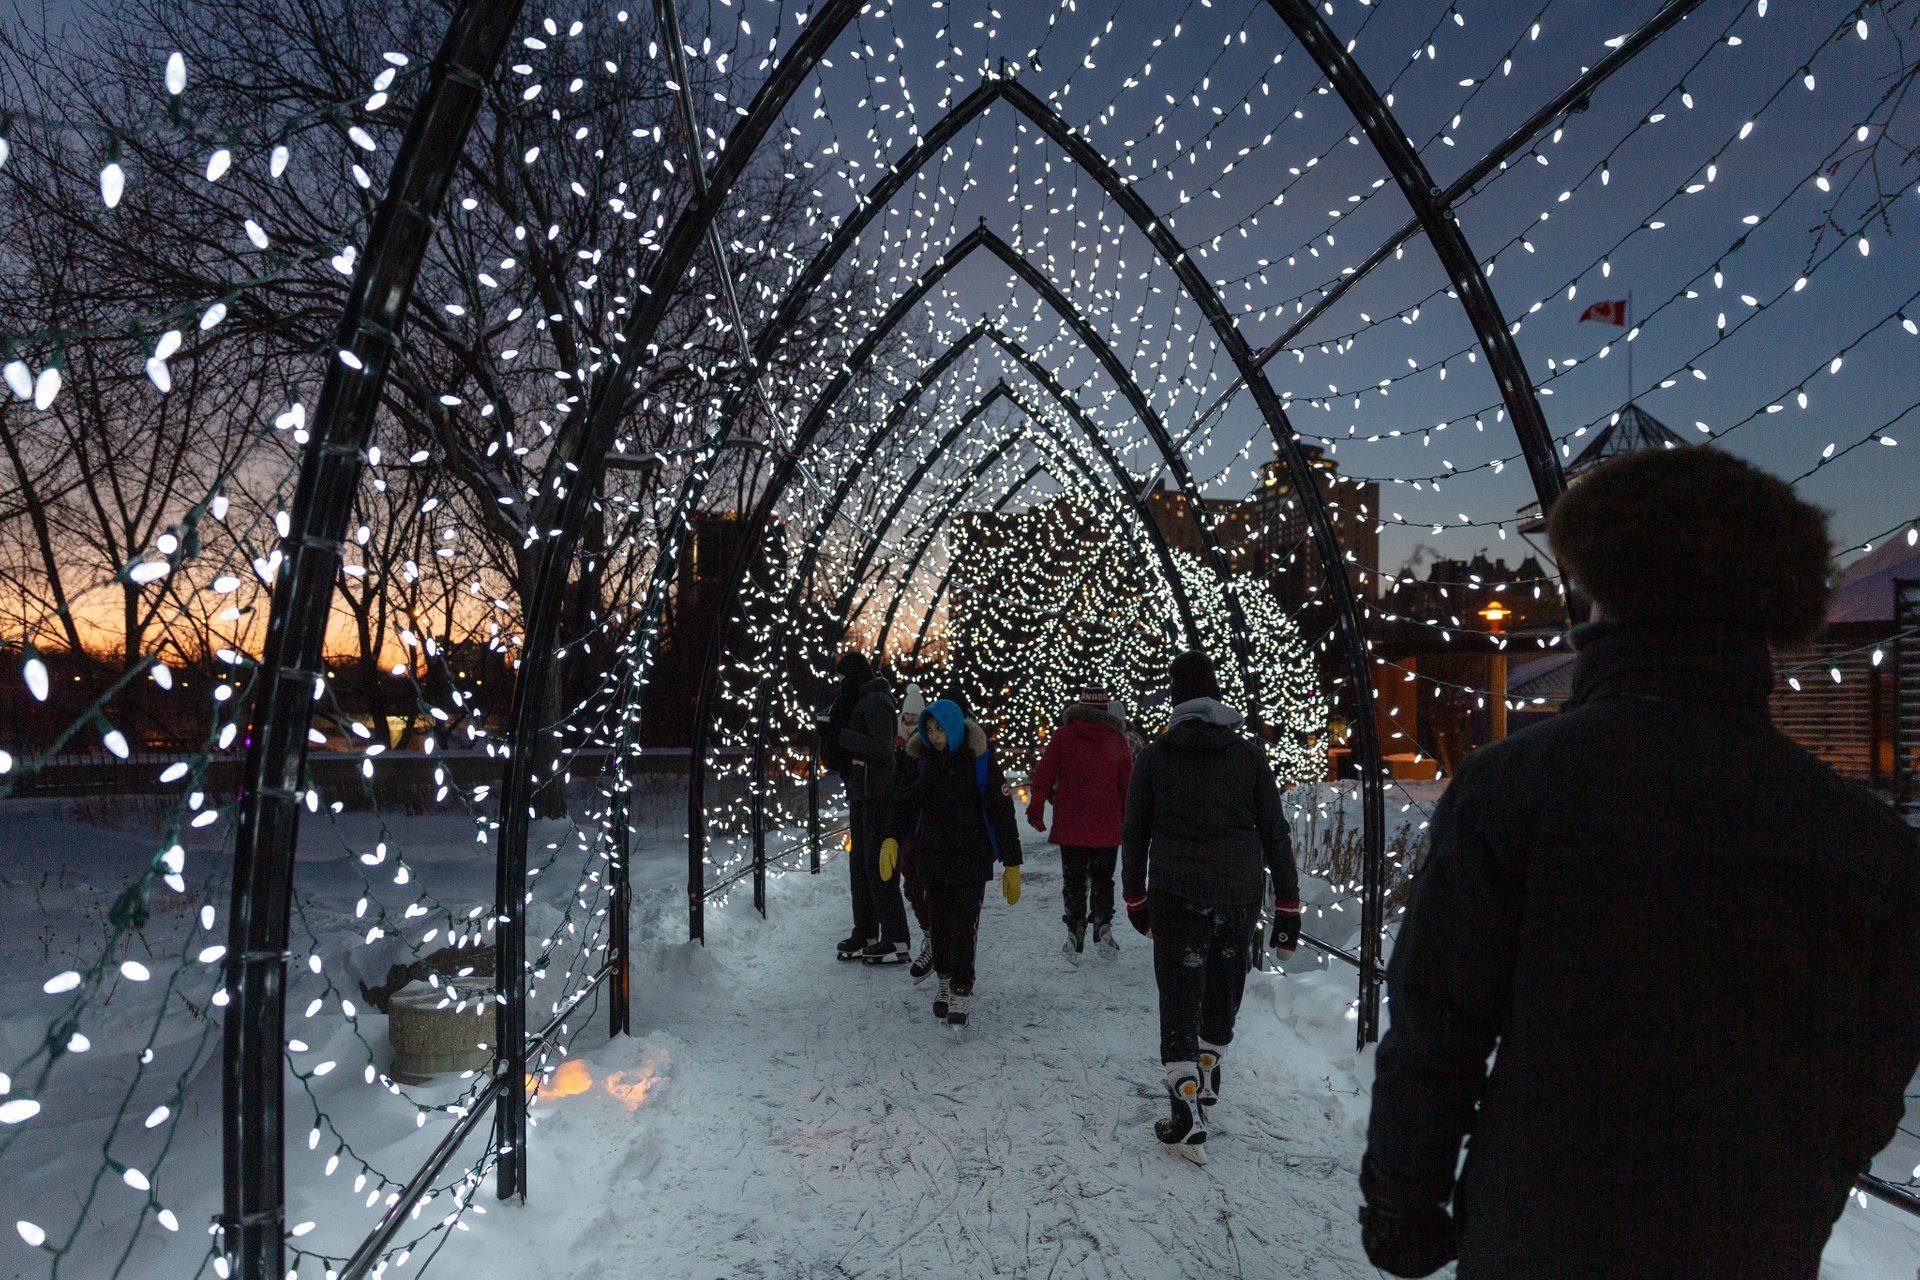 Arctic Glacier Winter Park at The Forks 2020